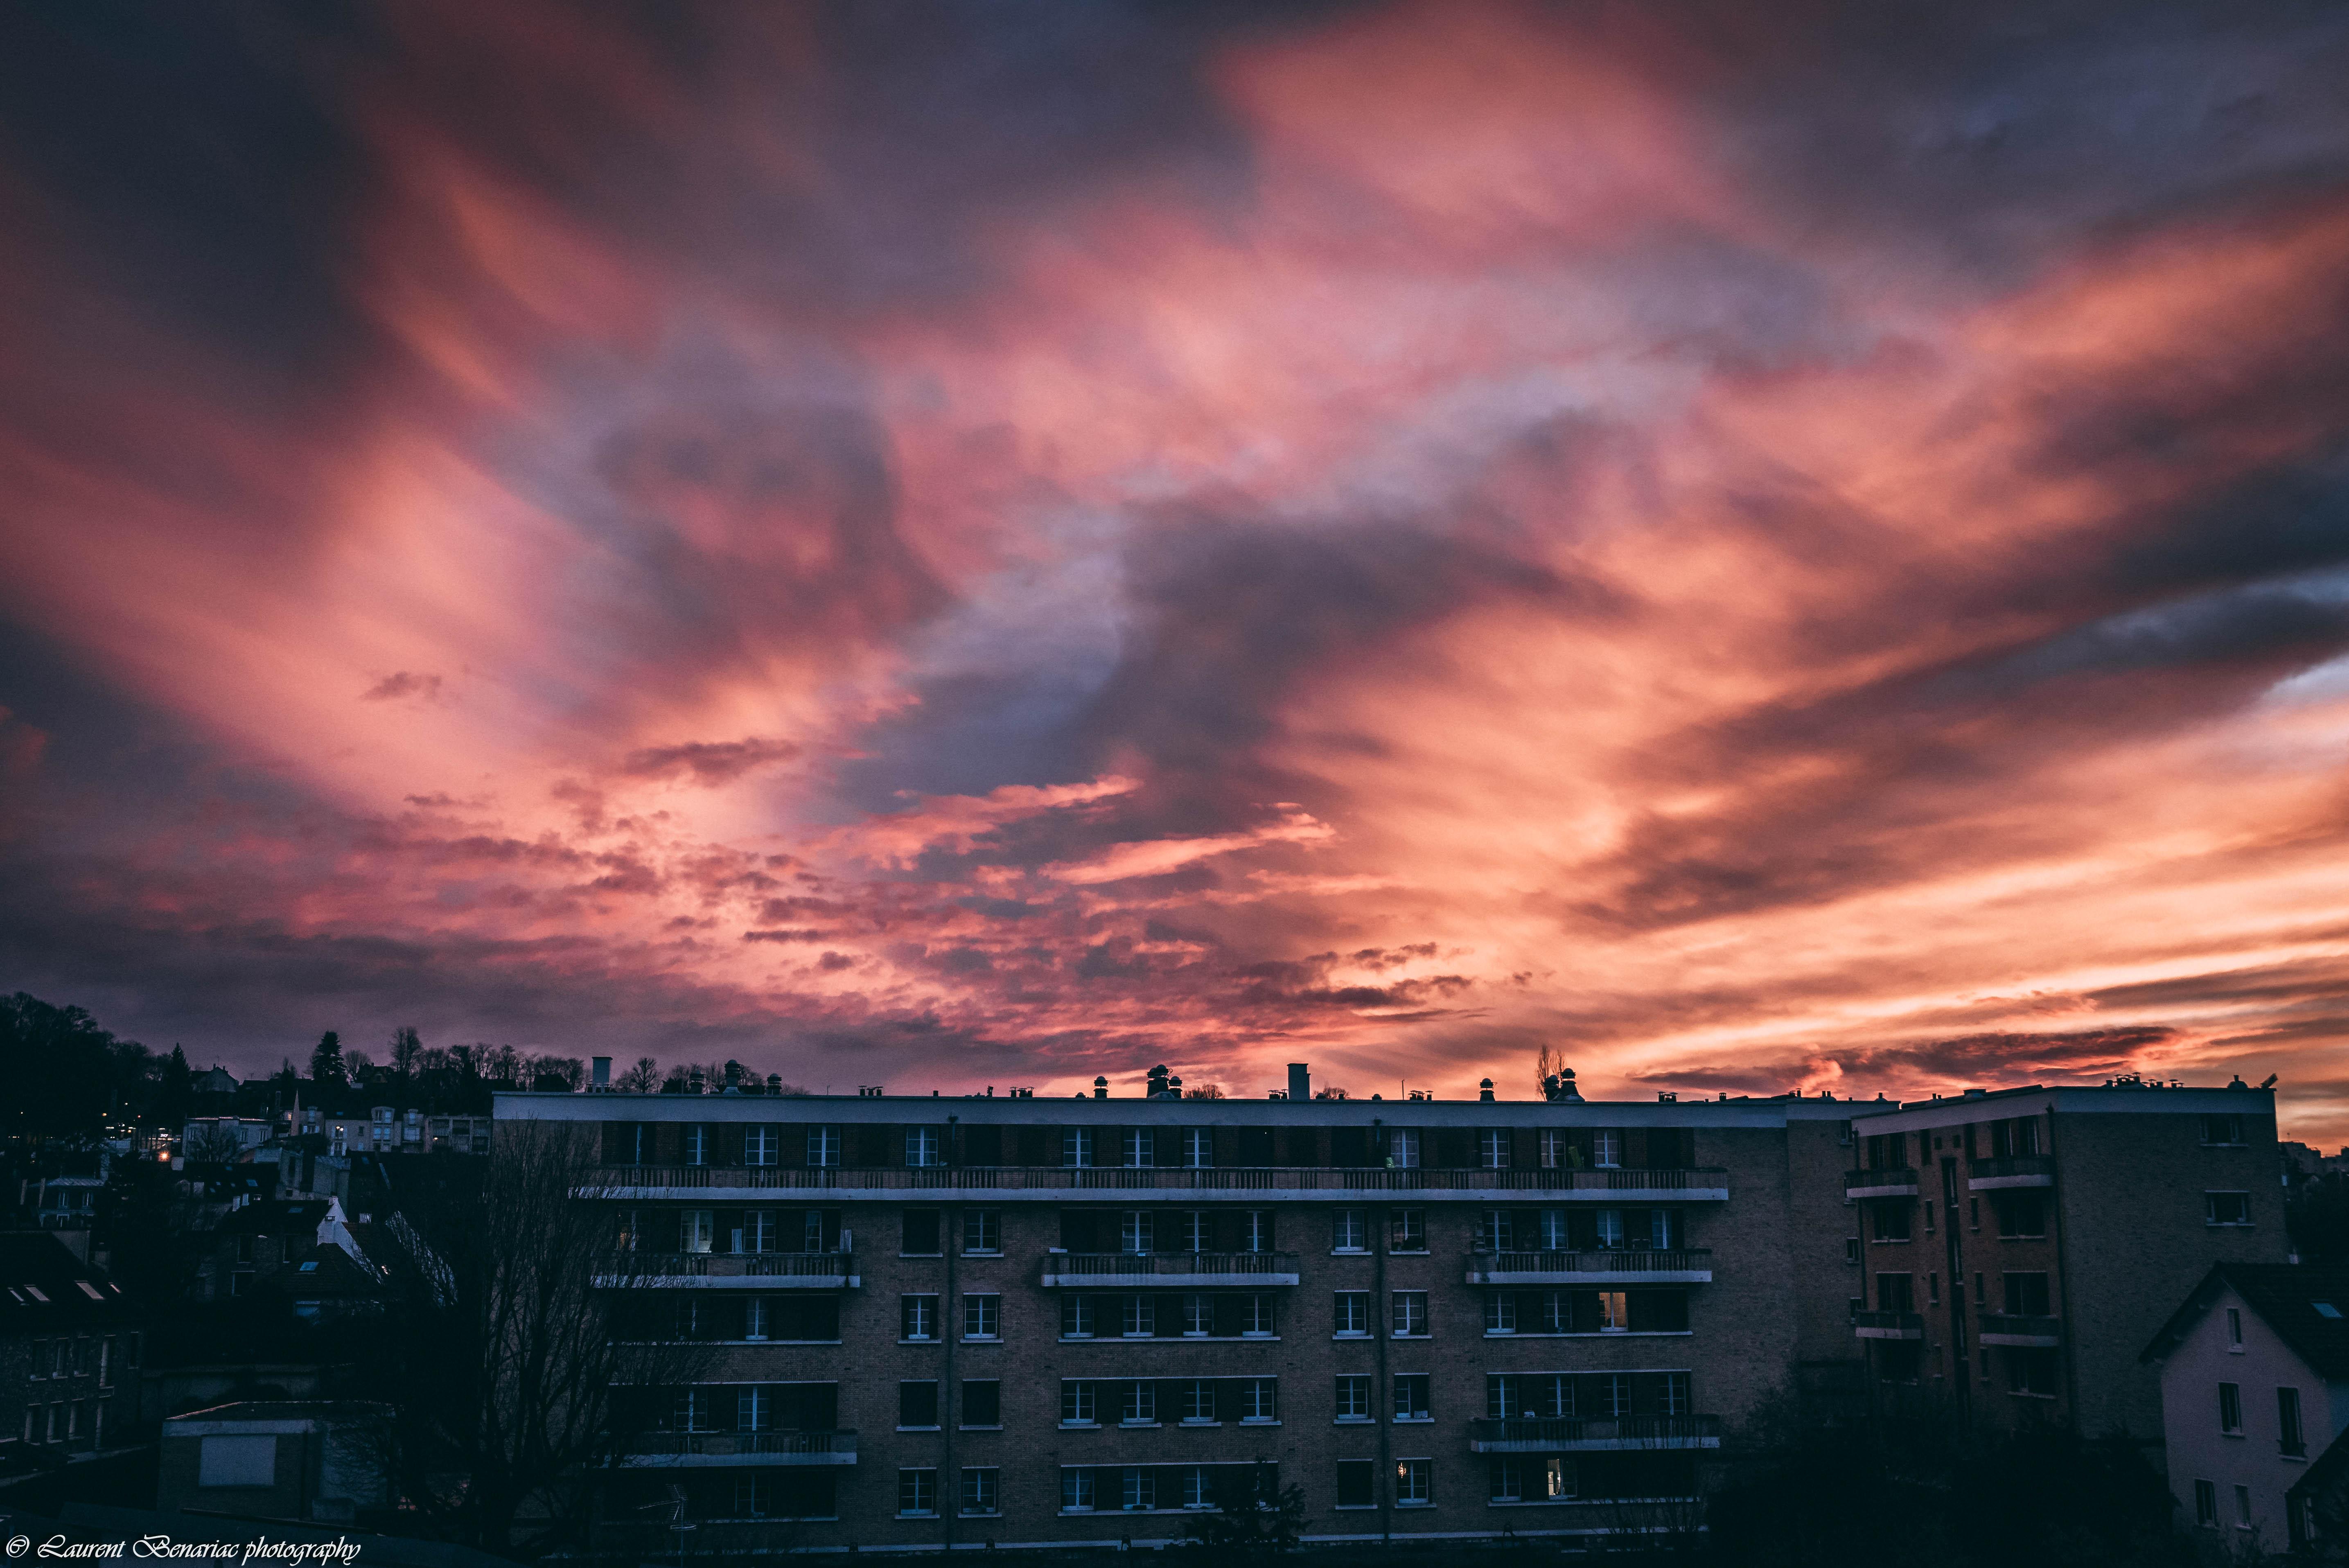 Saint-Cyr-L'ecole